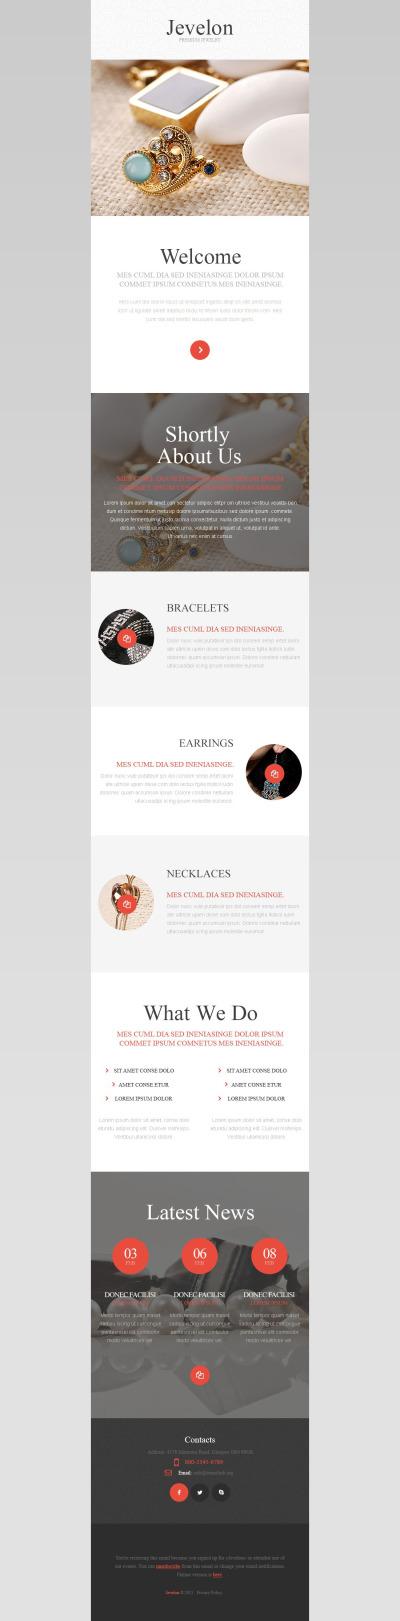 Jewelry Responsive Nieuwsbrief Template